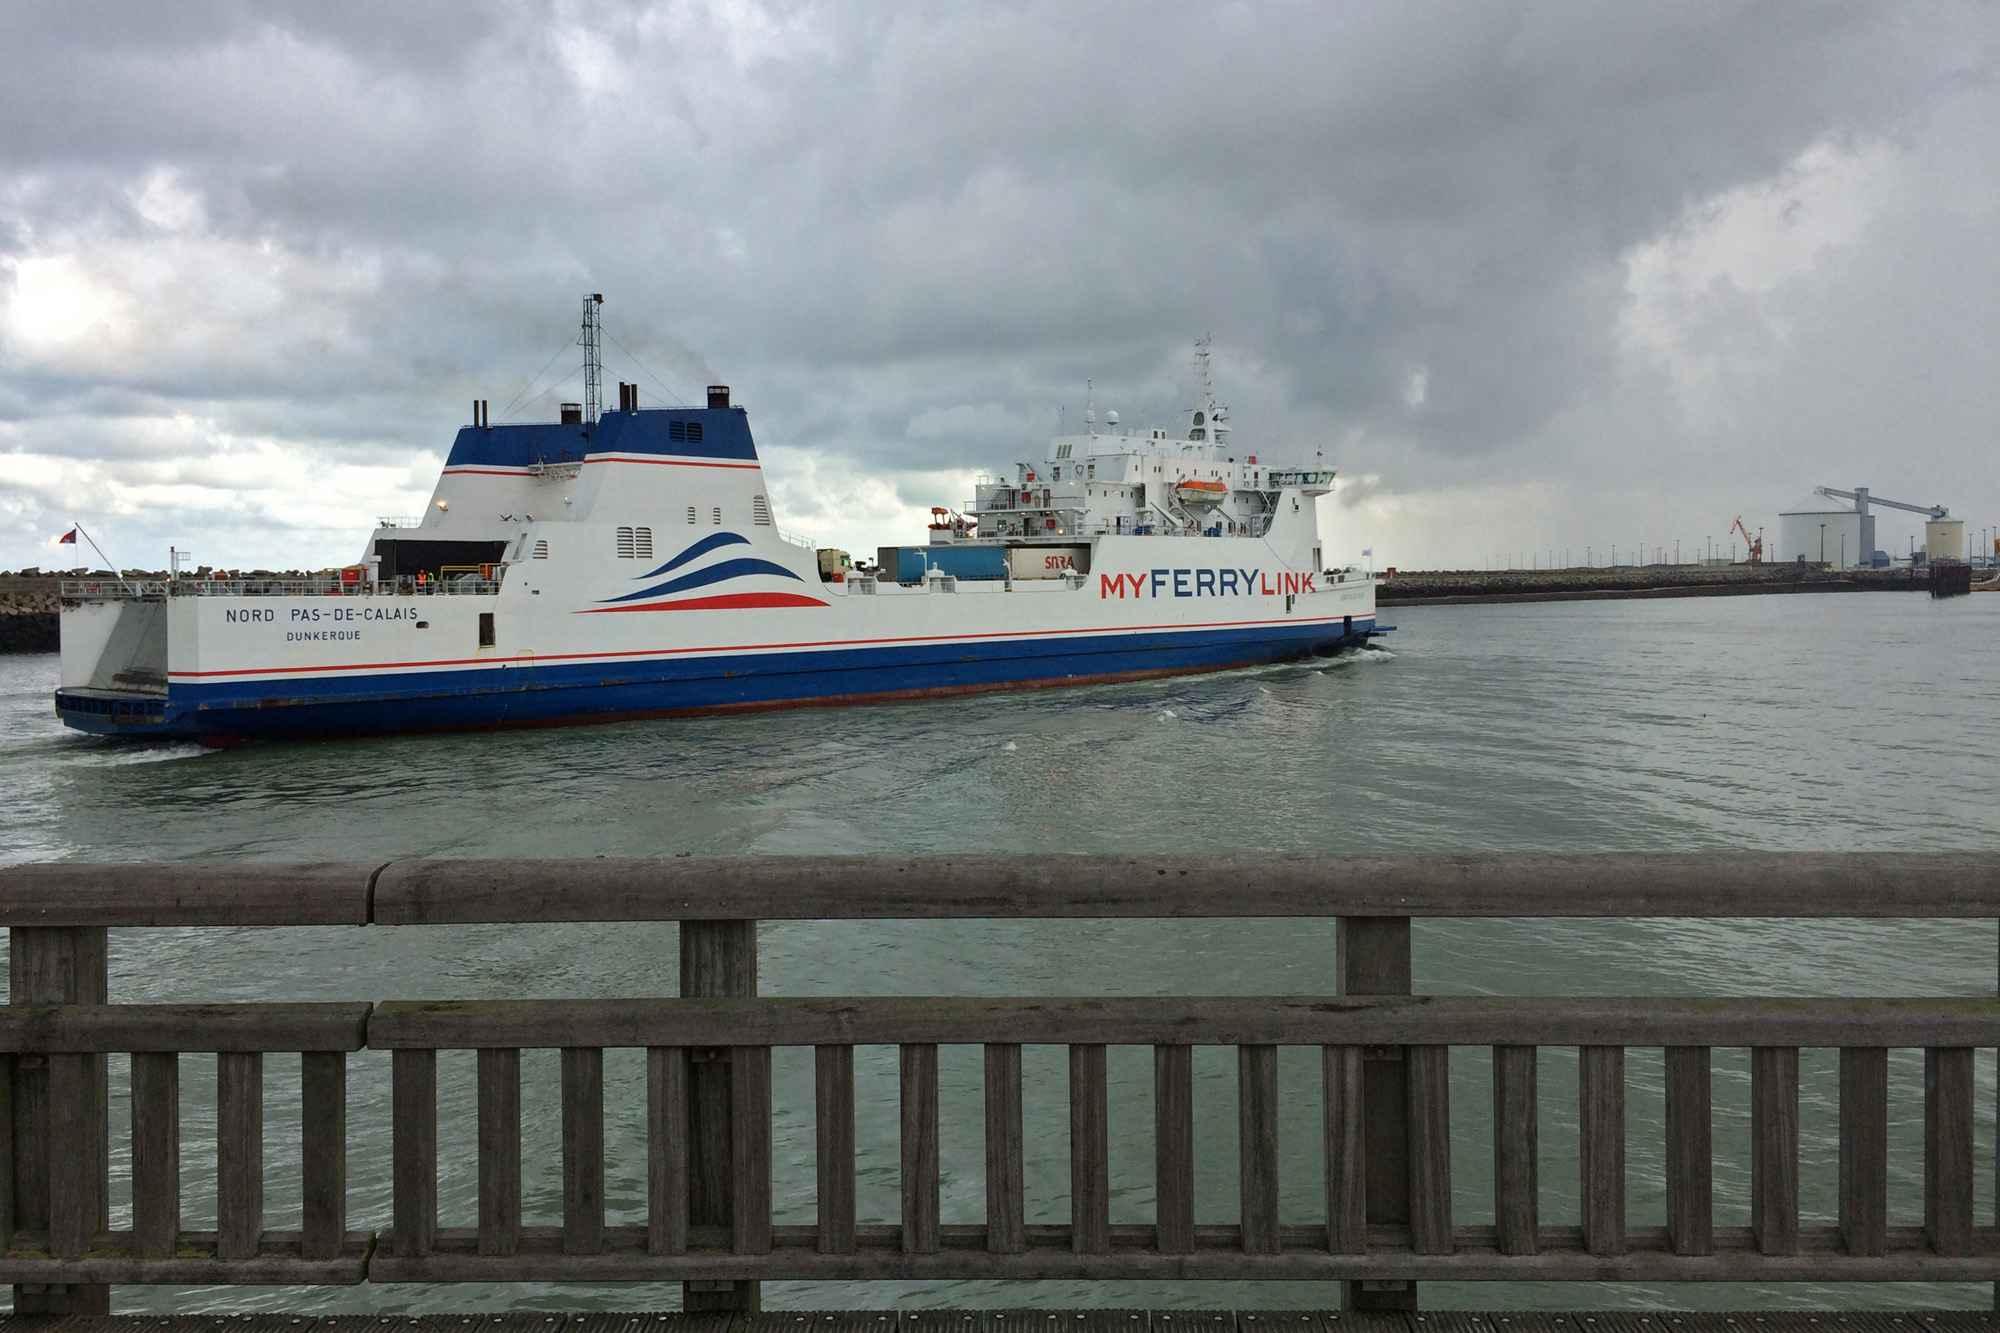 La Scop Seafrance Doit Plus De 19 Millions D 39 Euros Myferrylink